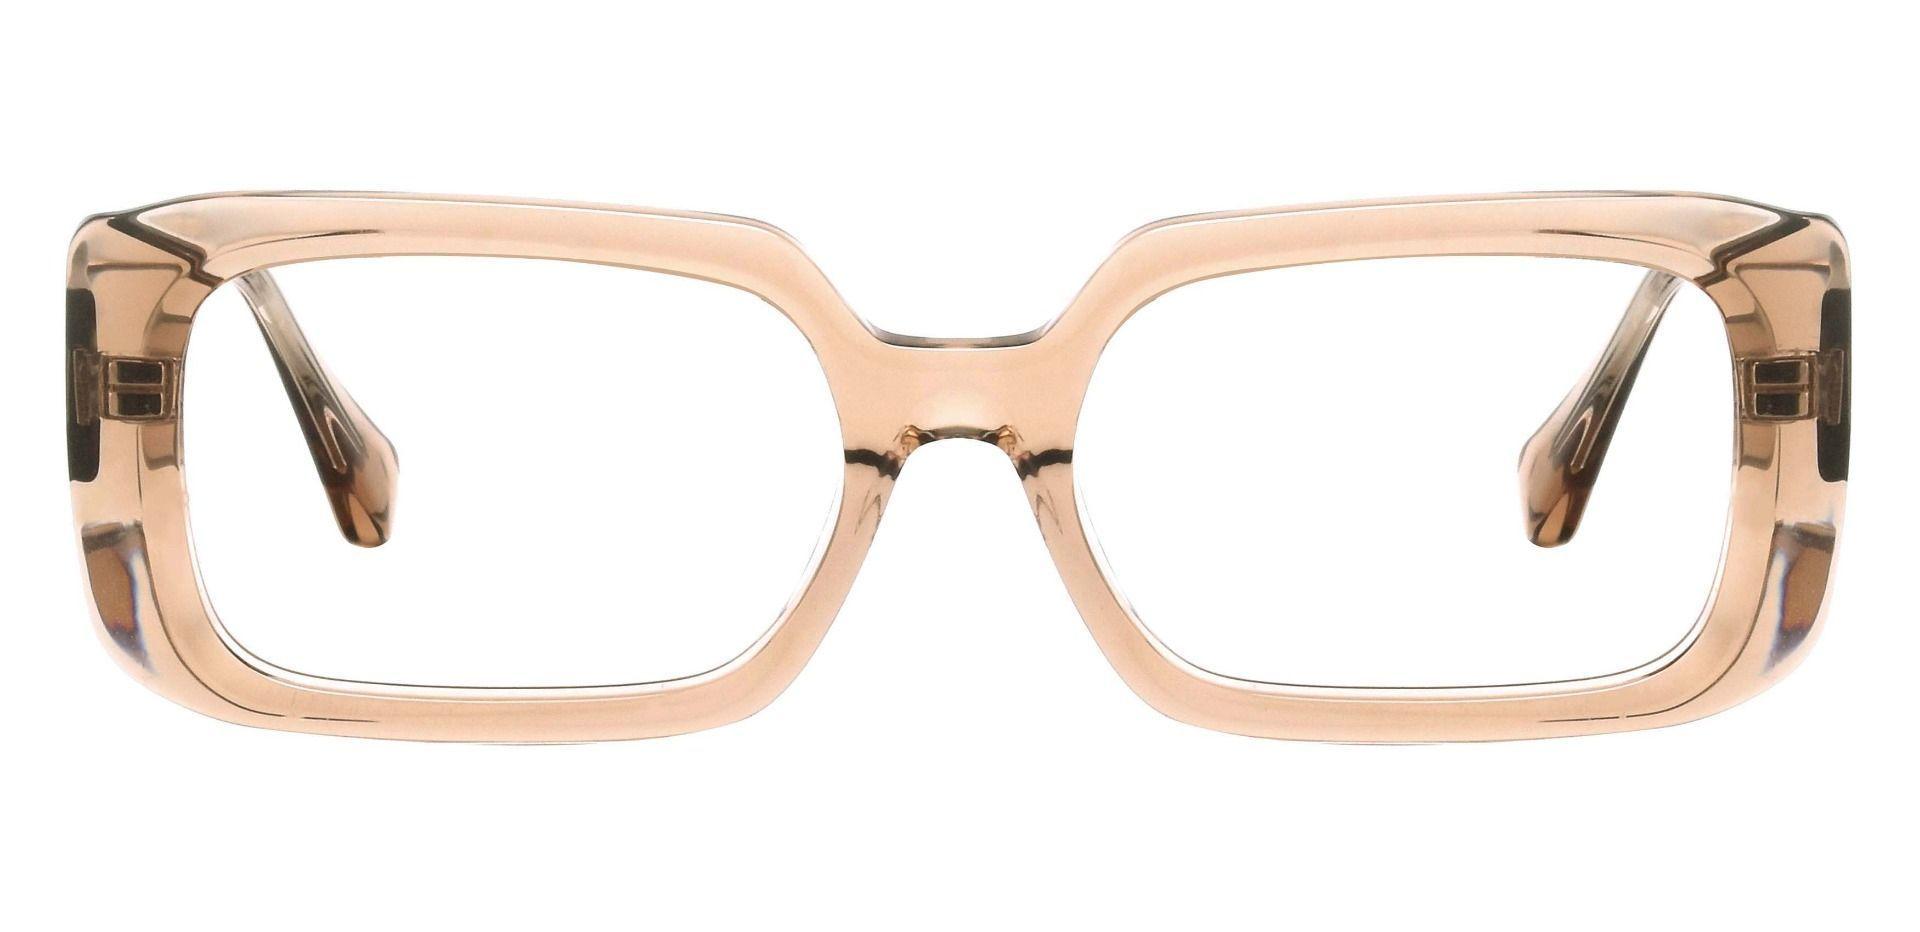 Grimes Rectangle Prescription Glasses - Brown